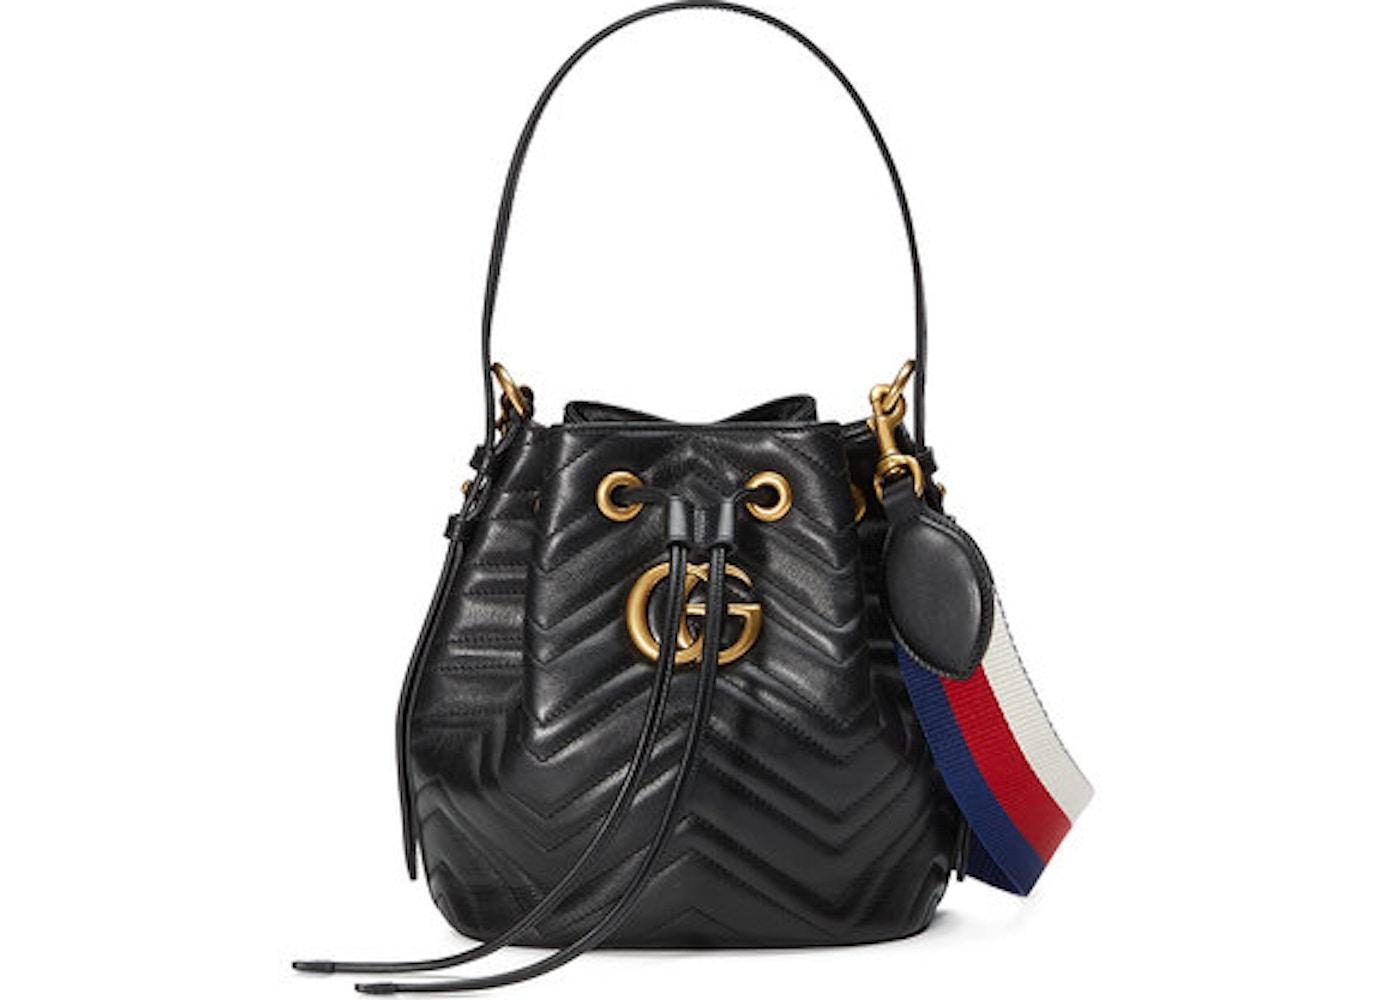 af8620b6cb5c Gucci Marmont Bucket Bag GG Matelasse Chevron Small Black